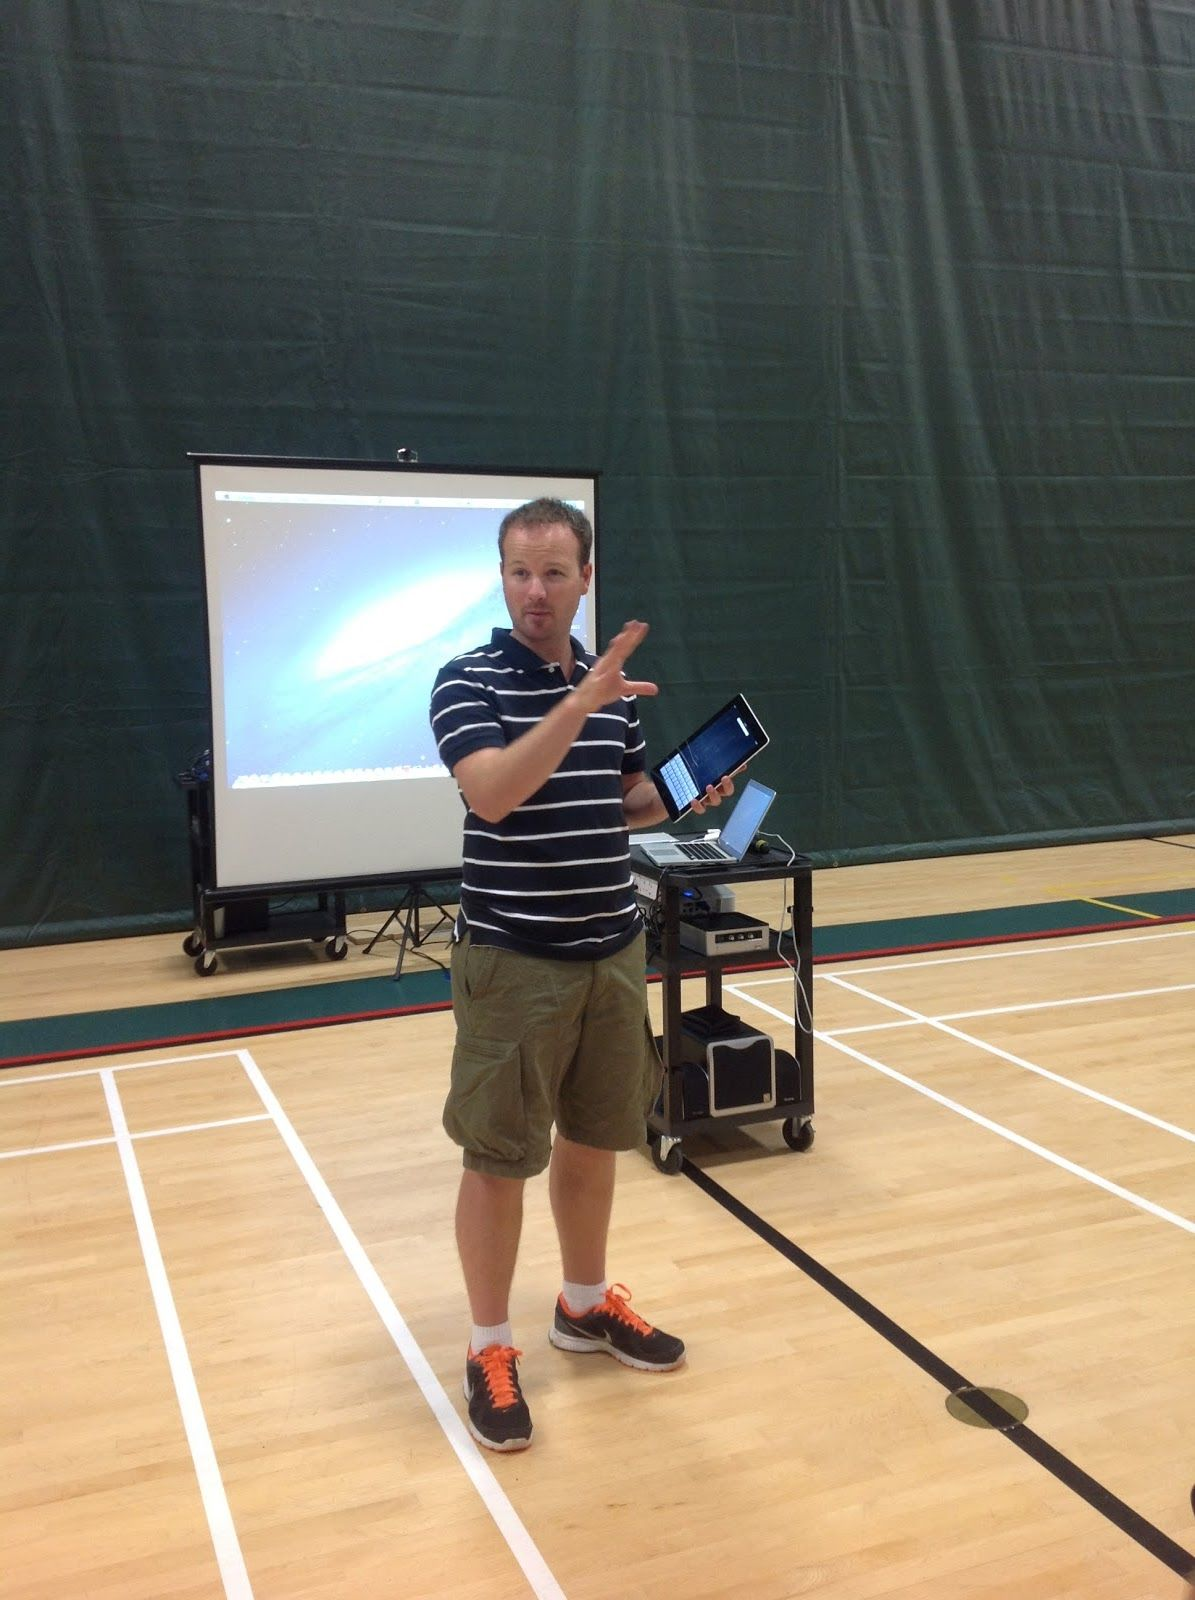 Using An Ipad In The Phys Ed Classroom